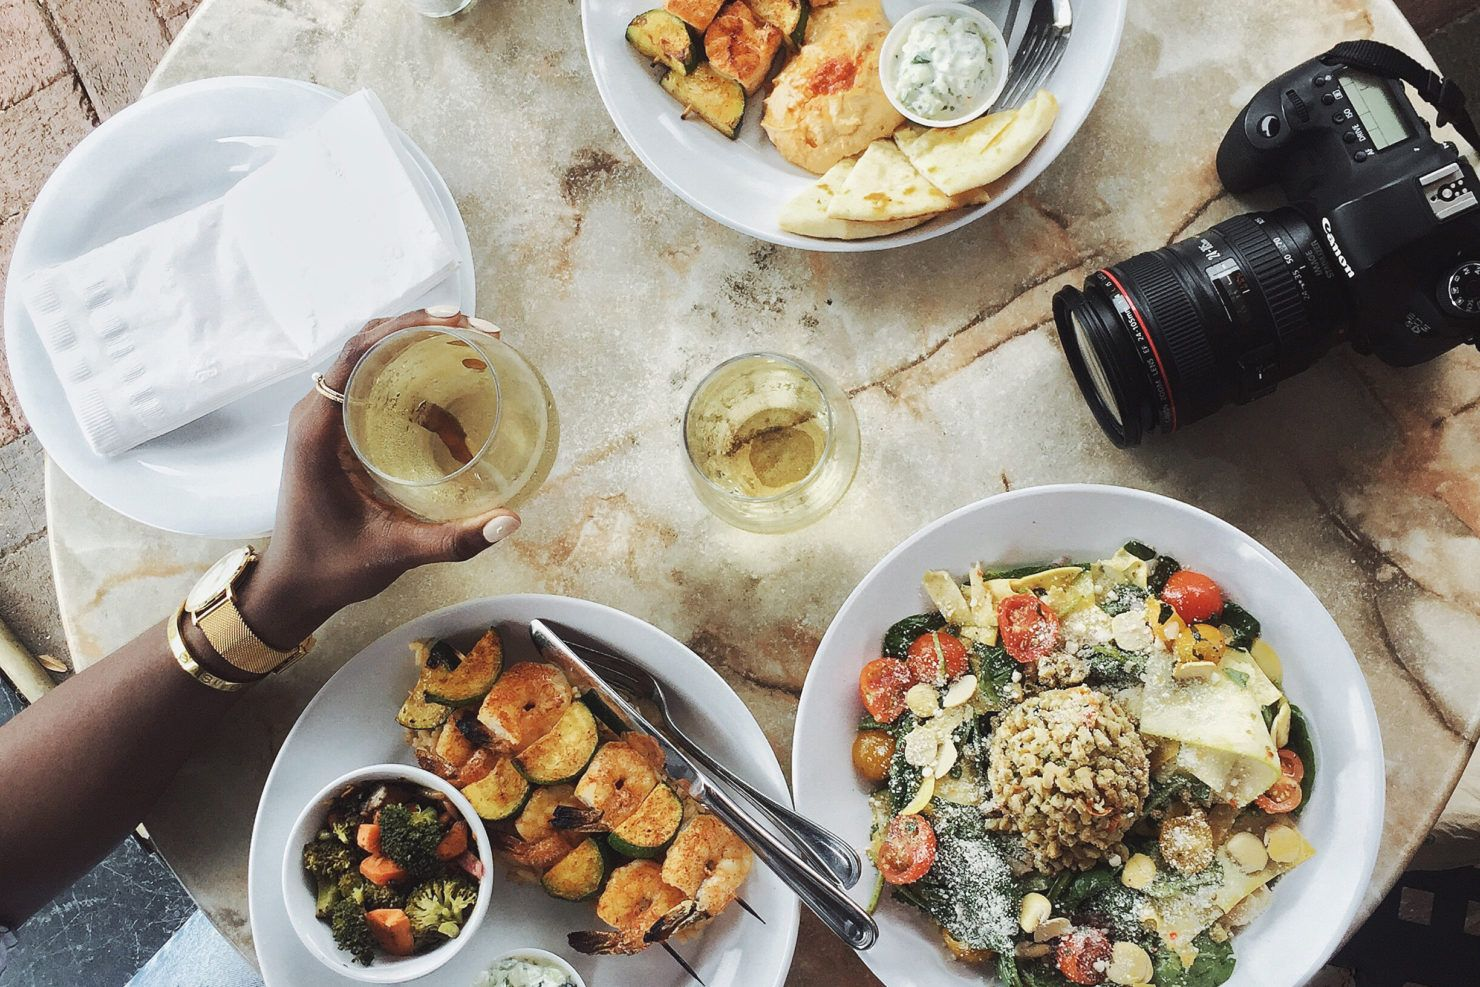 Top 5 Instagram Worthy Breakfast Brunch Restaurants In Atlanta Millennielle Brunch Restaurants Best Lunch Restaurants Lunch Restaurants